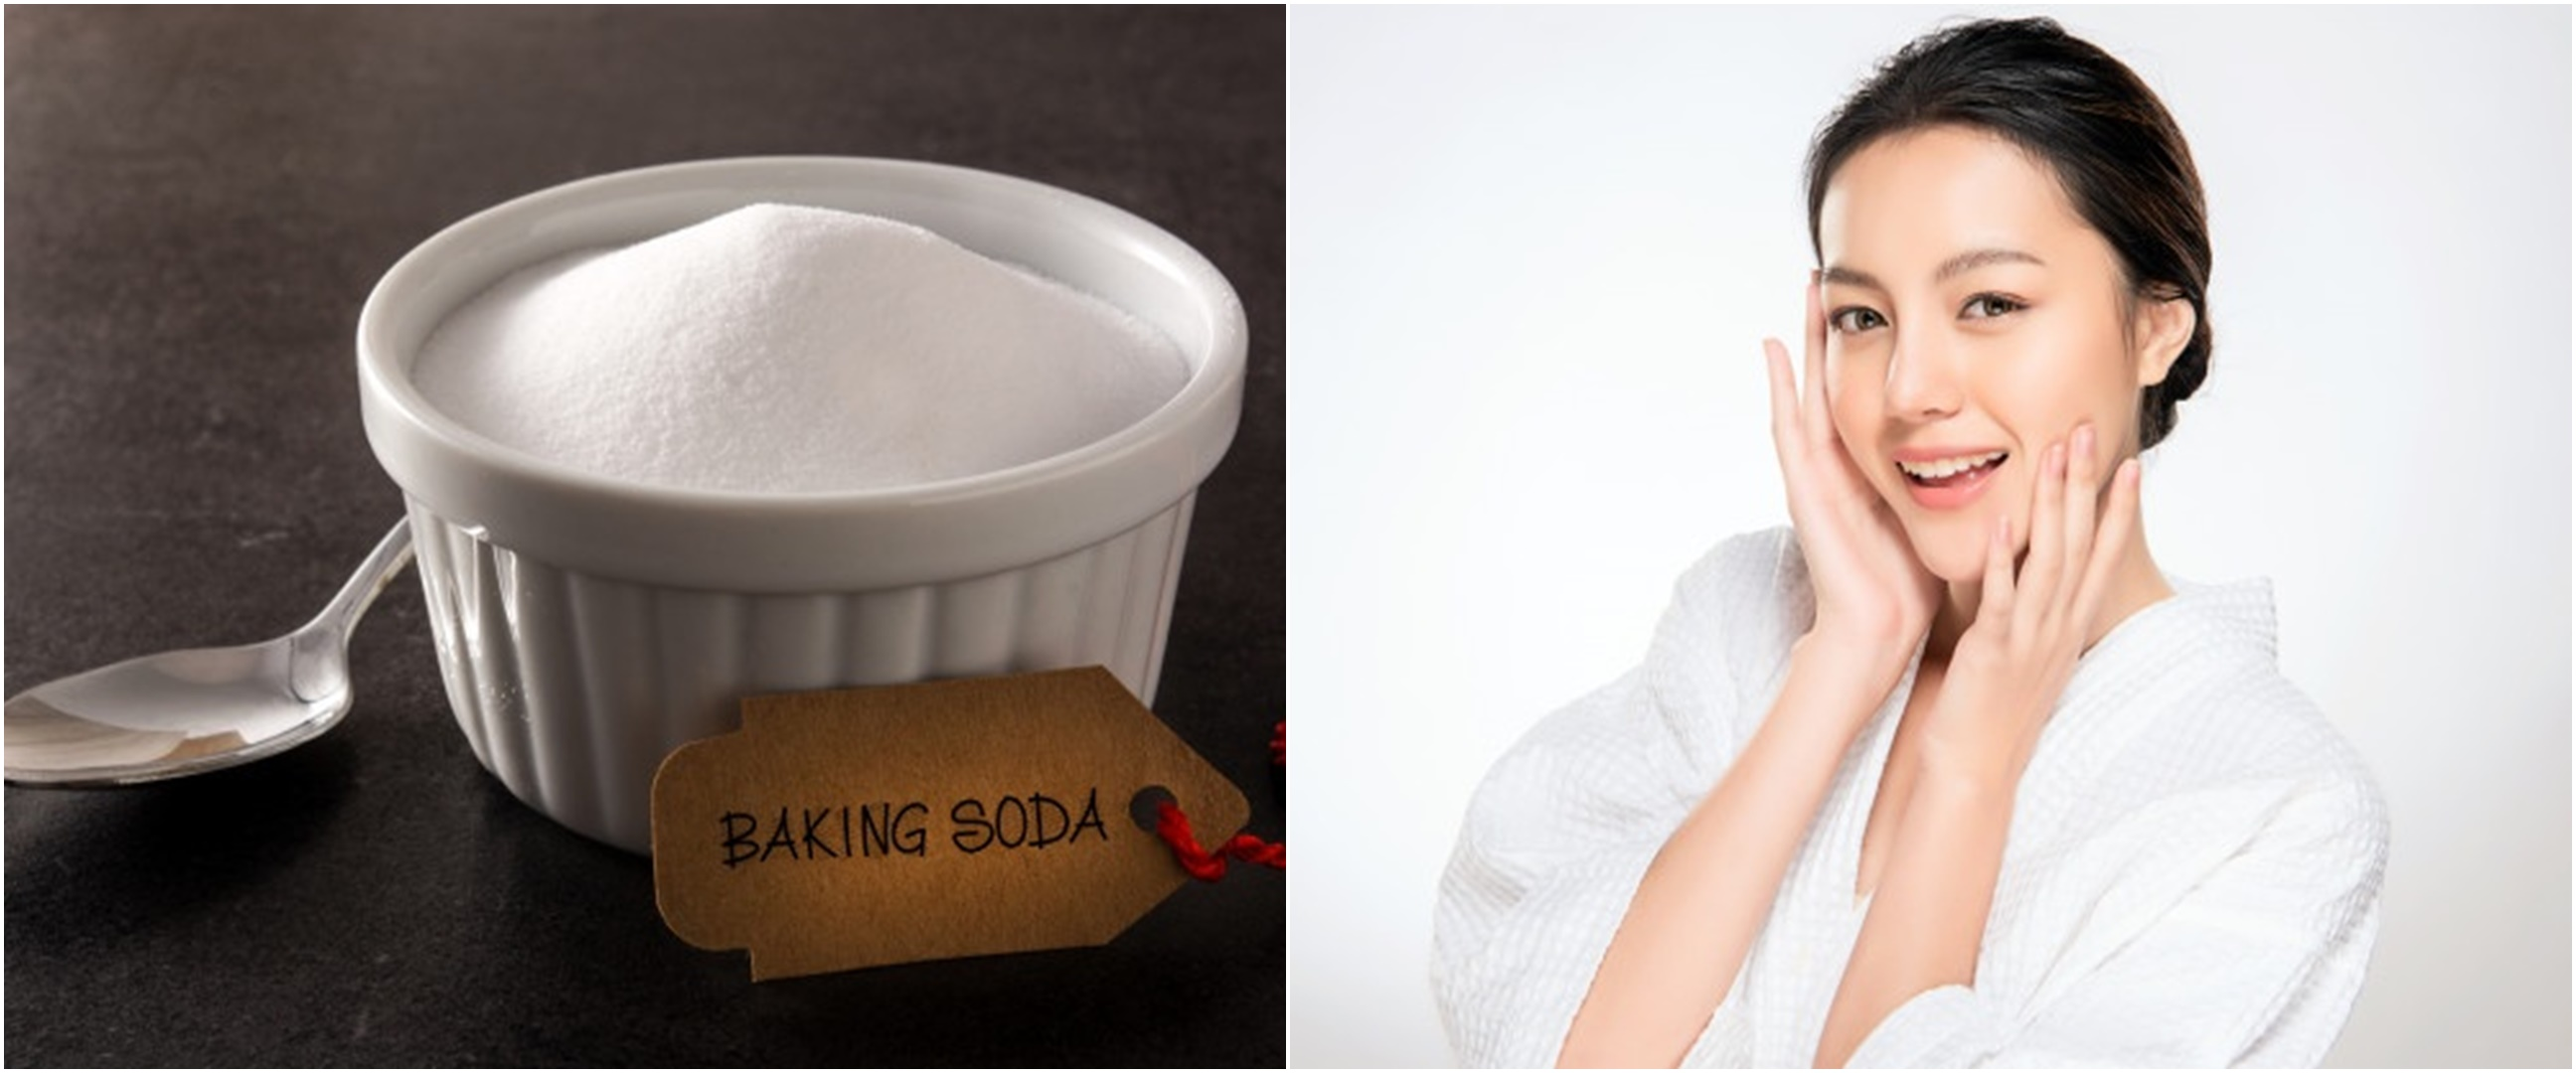 10 Manfaat baking soda untuk kecantikan dan cara penggunaannya